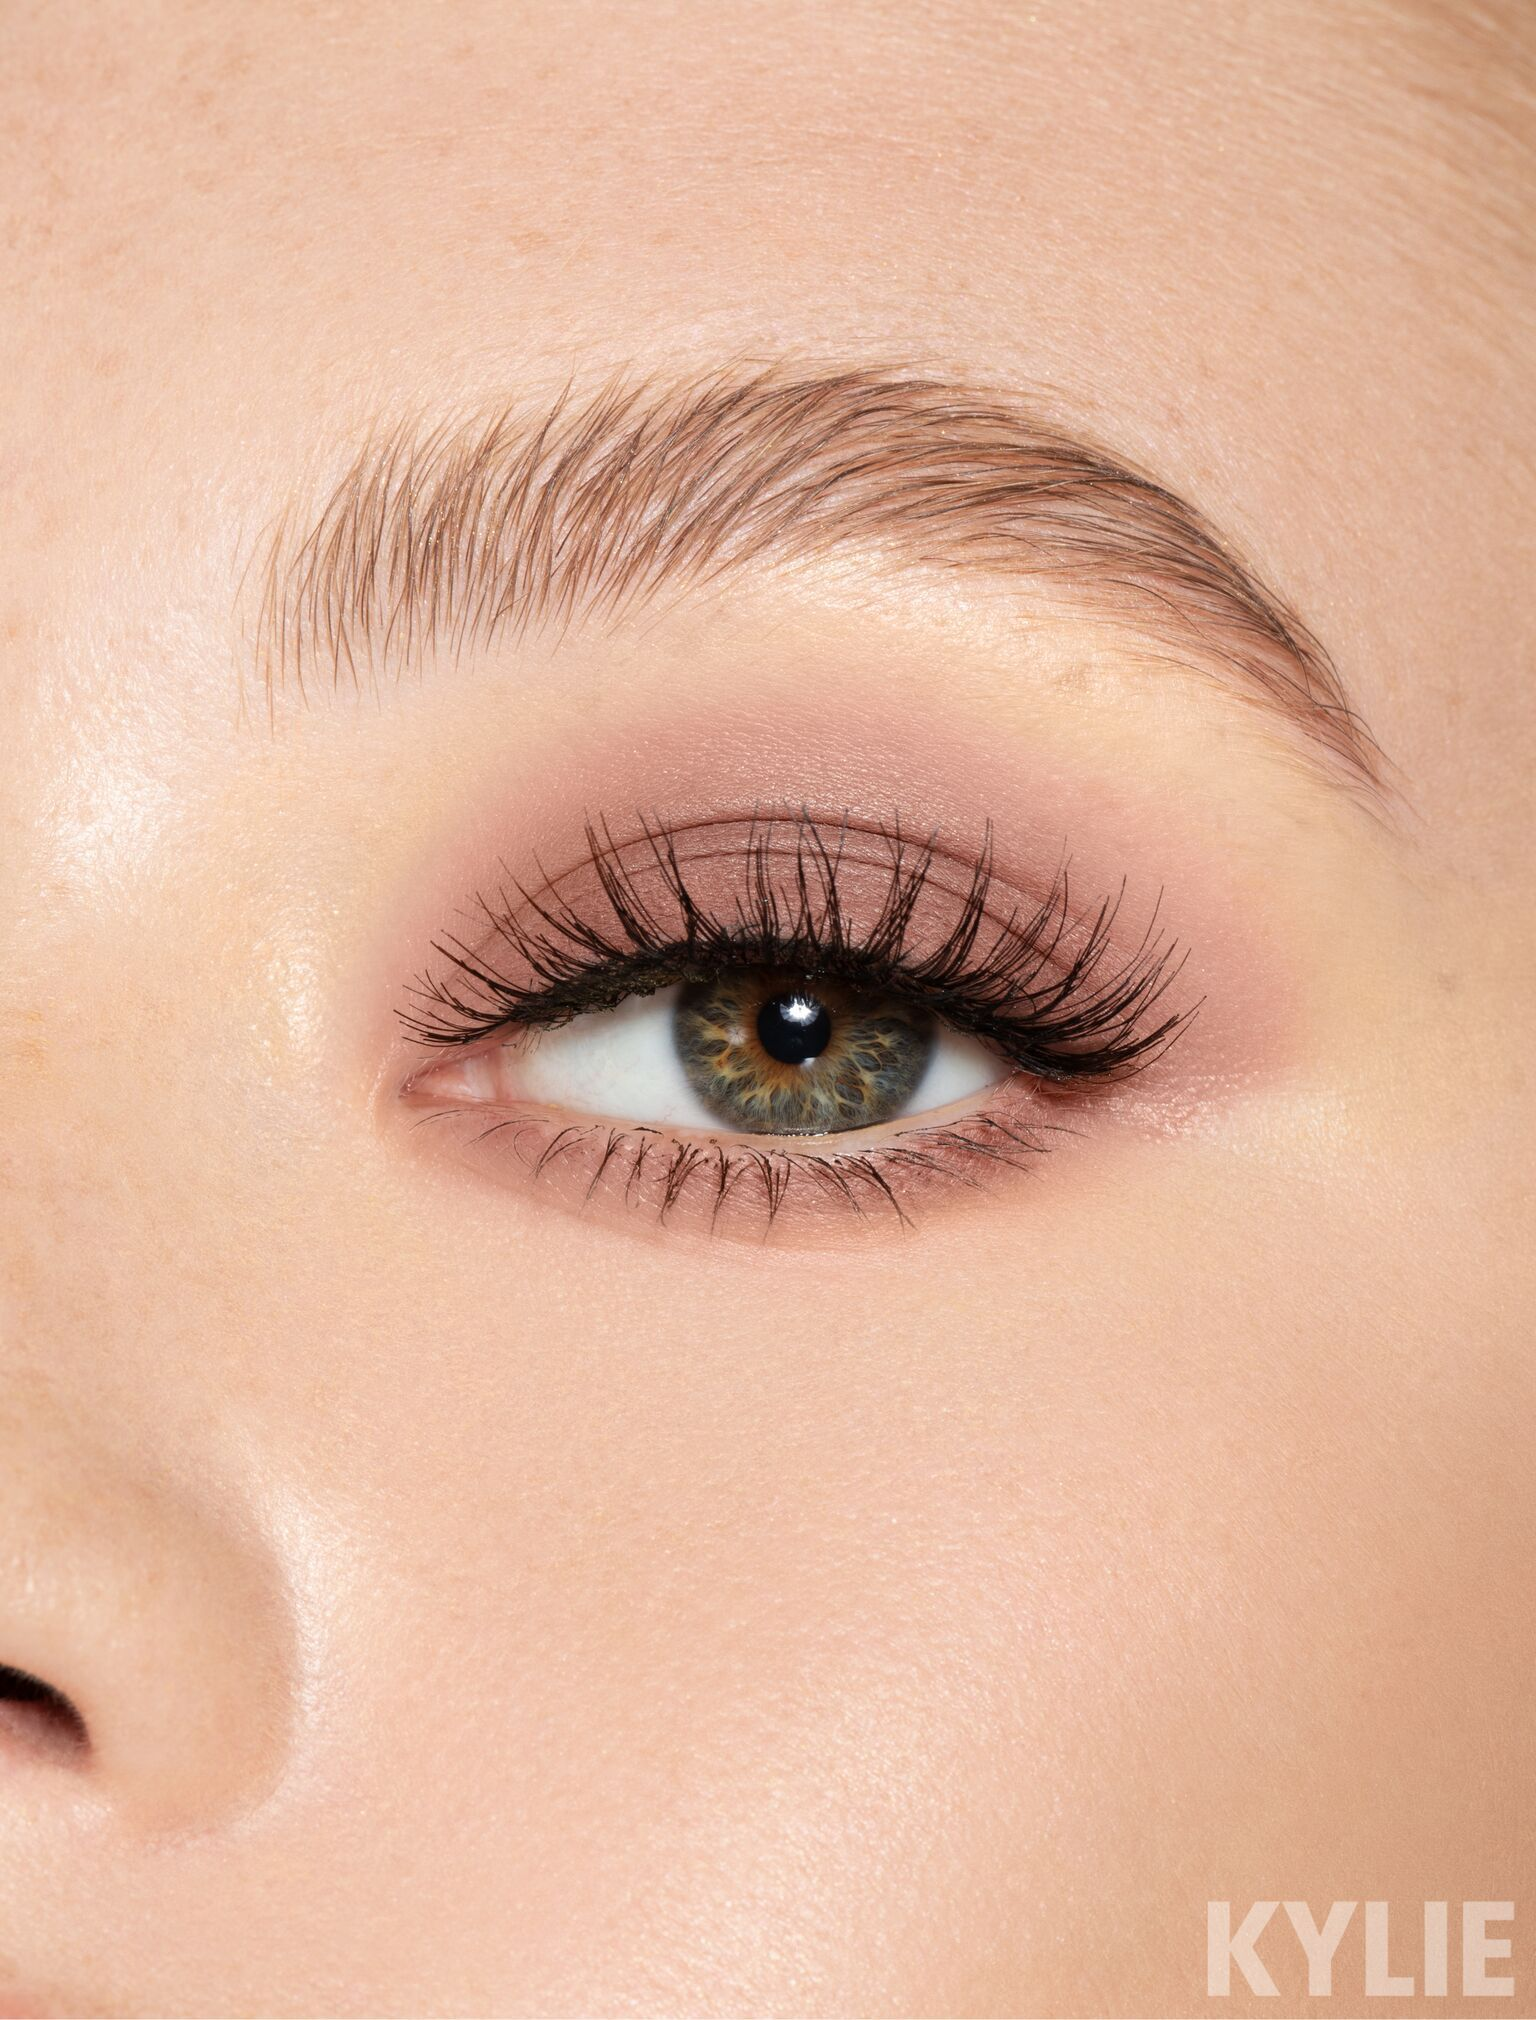 Party Time Eyeshadow Single Eye makeup, Makeup, Kylie